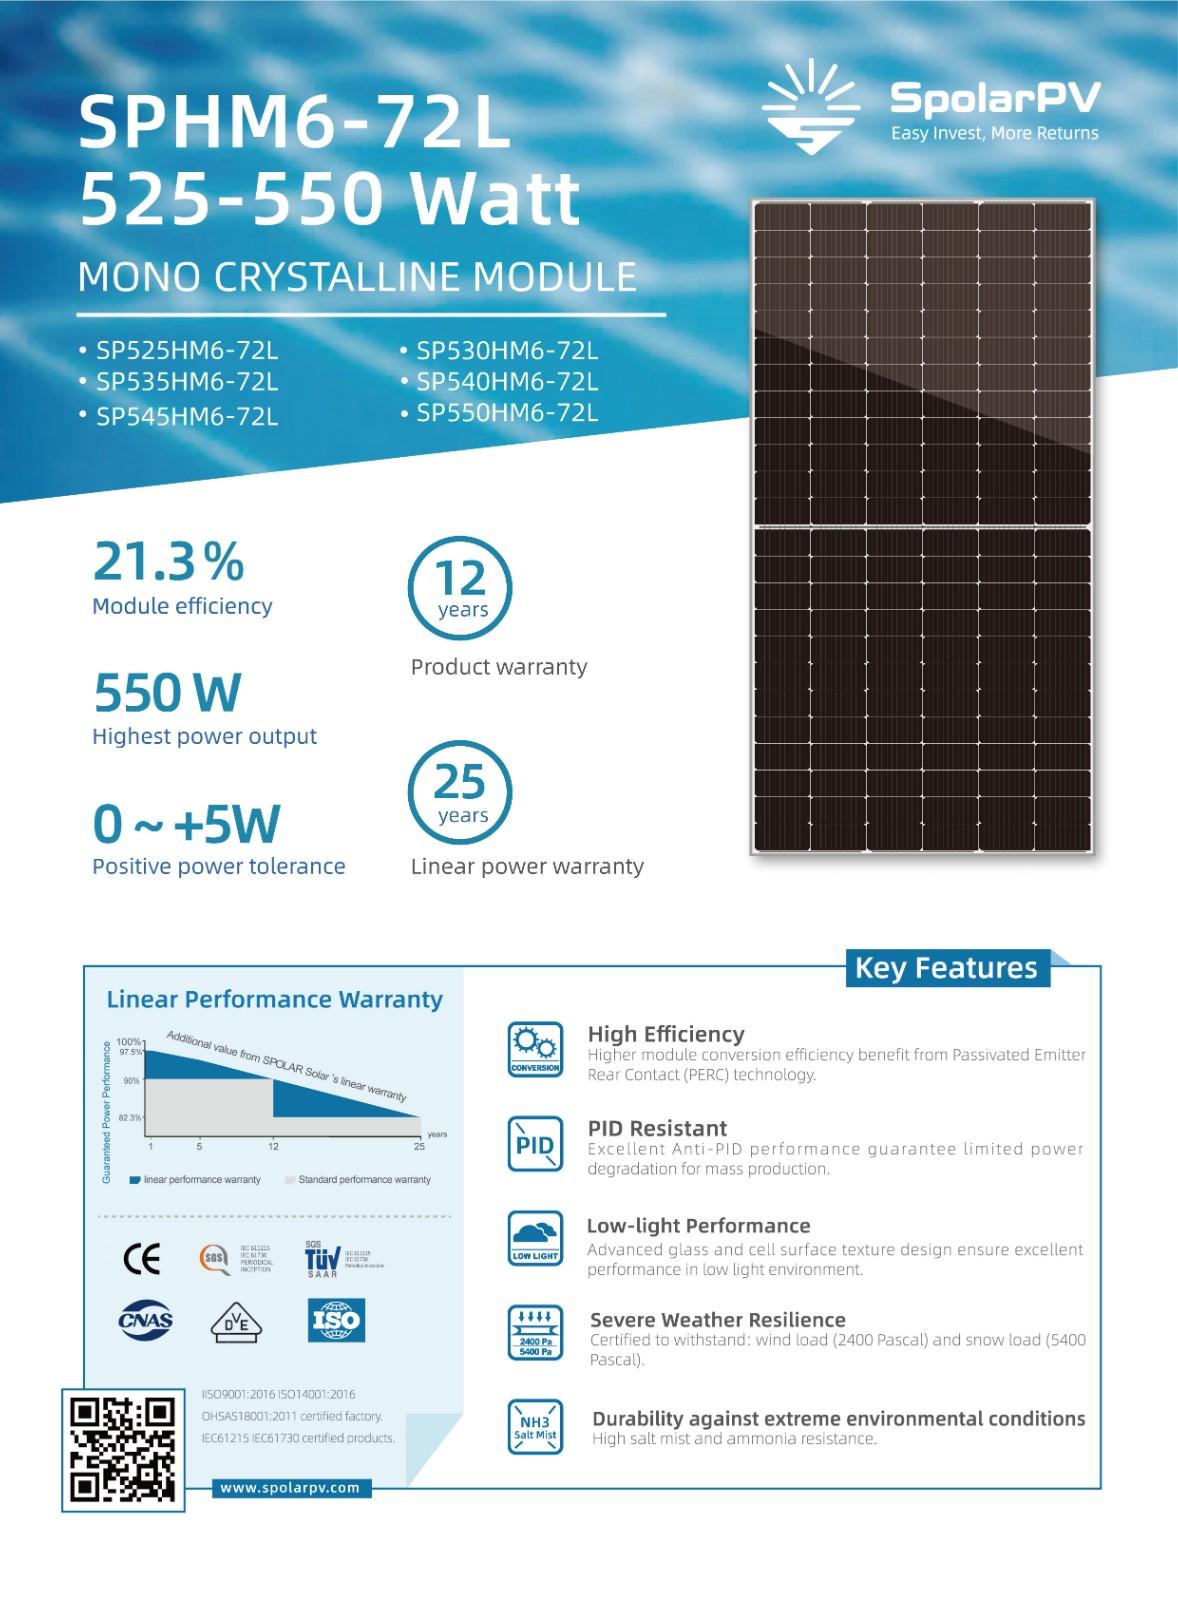 excellent Anti-PID performance solar module